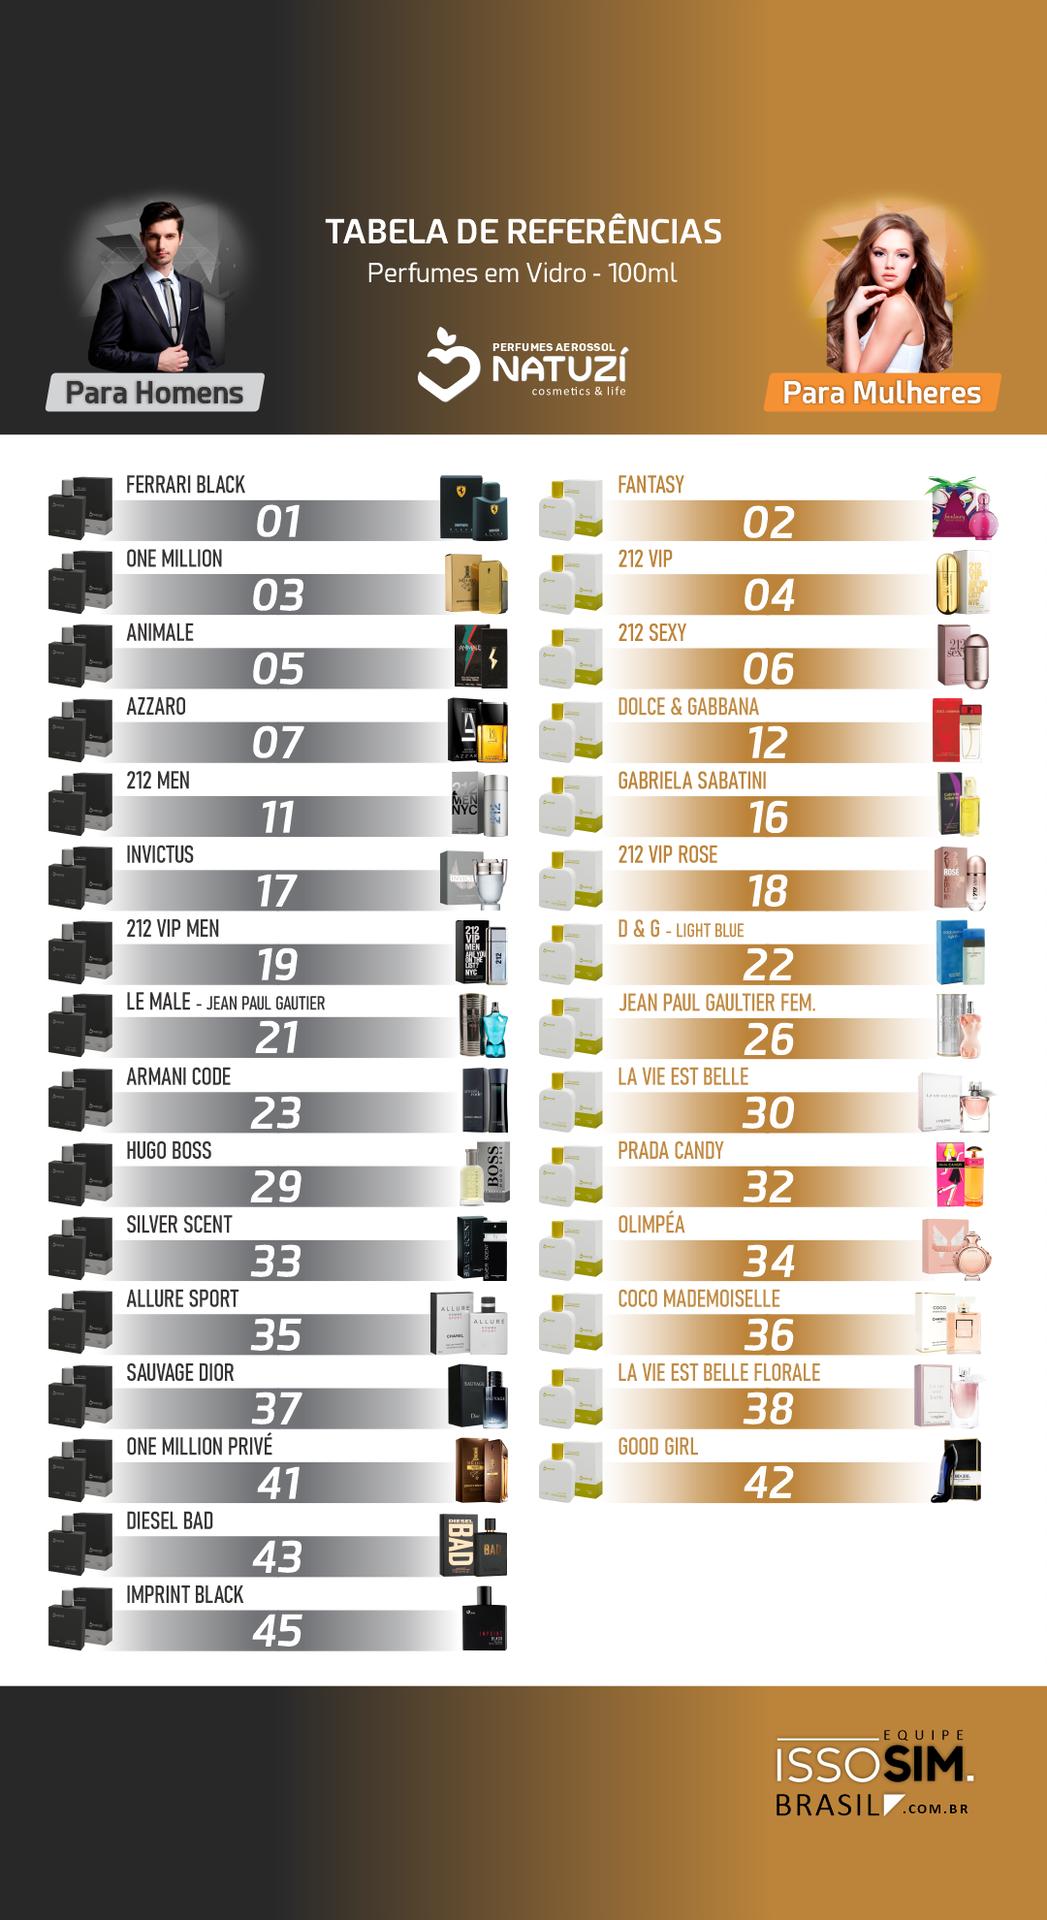 Tabelas de Referências dos Perfumes Natuzí 6